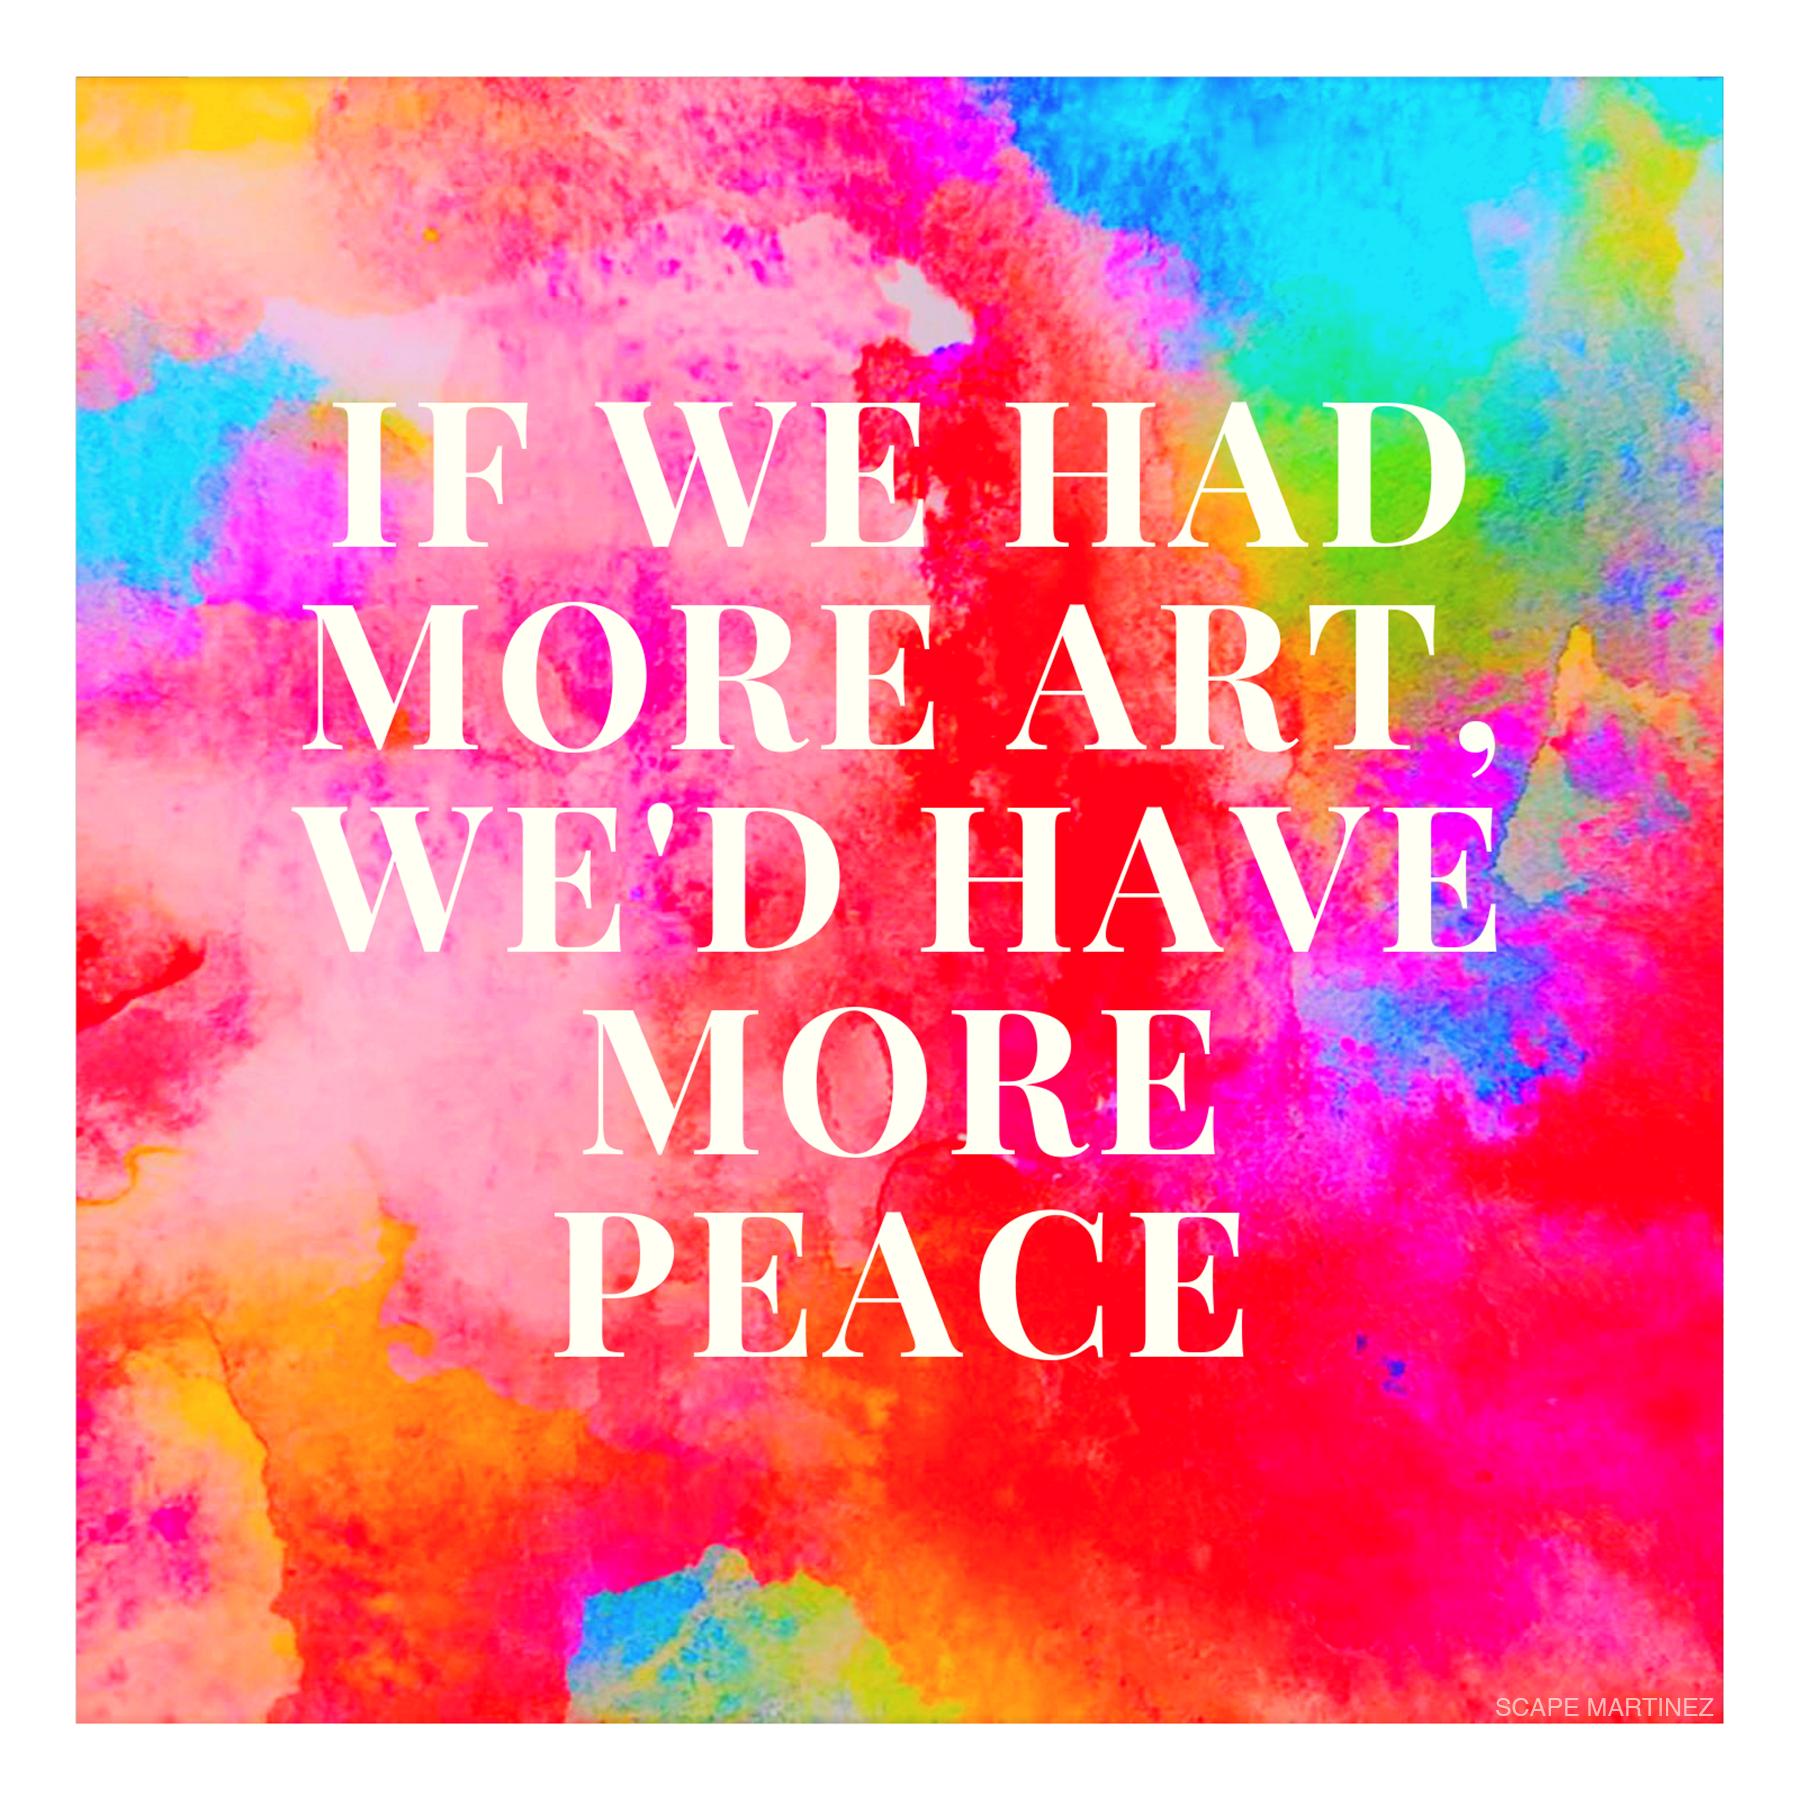 More Art = More Peace